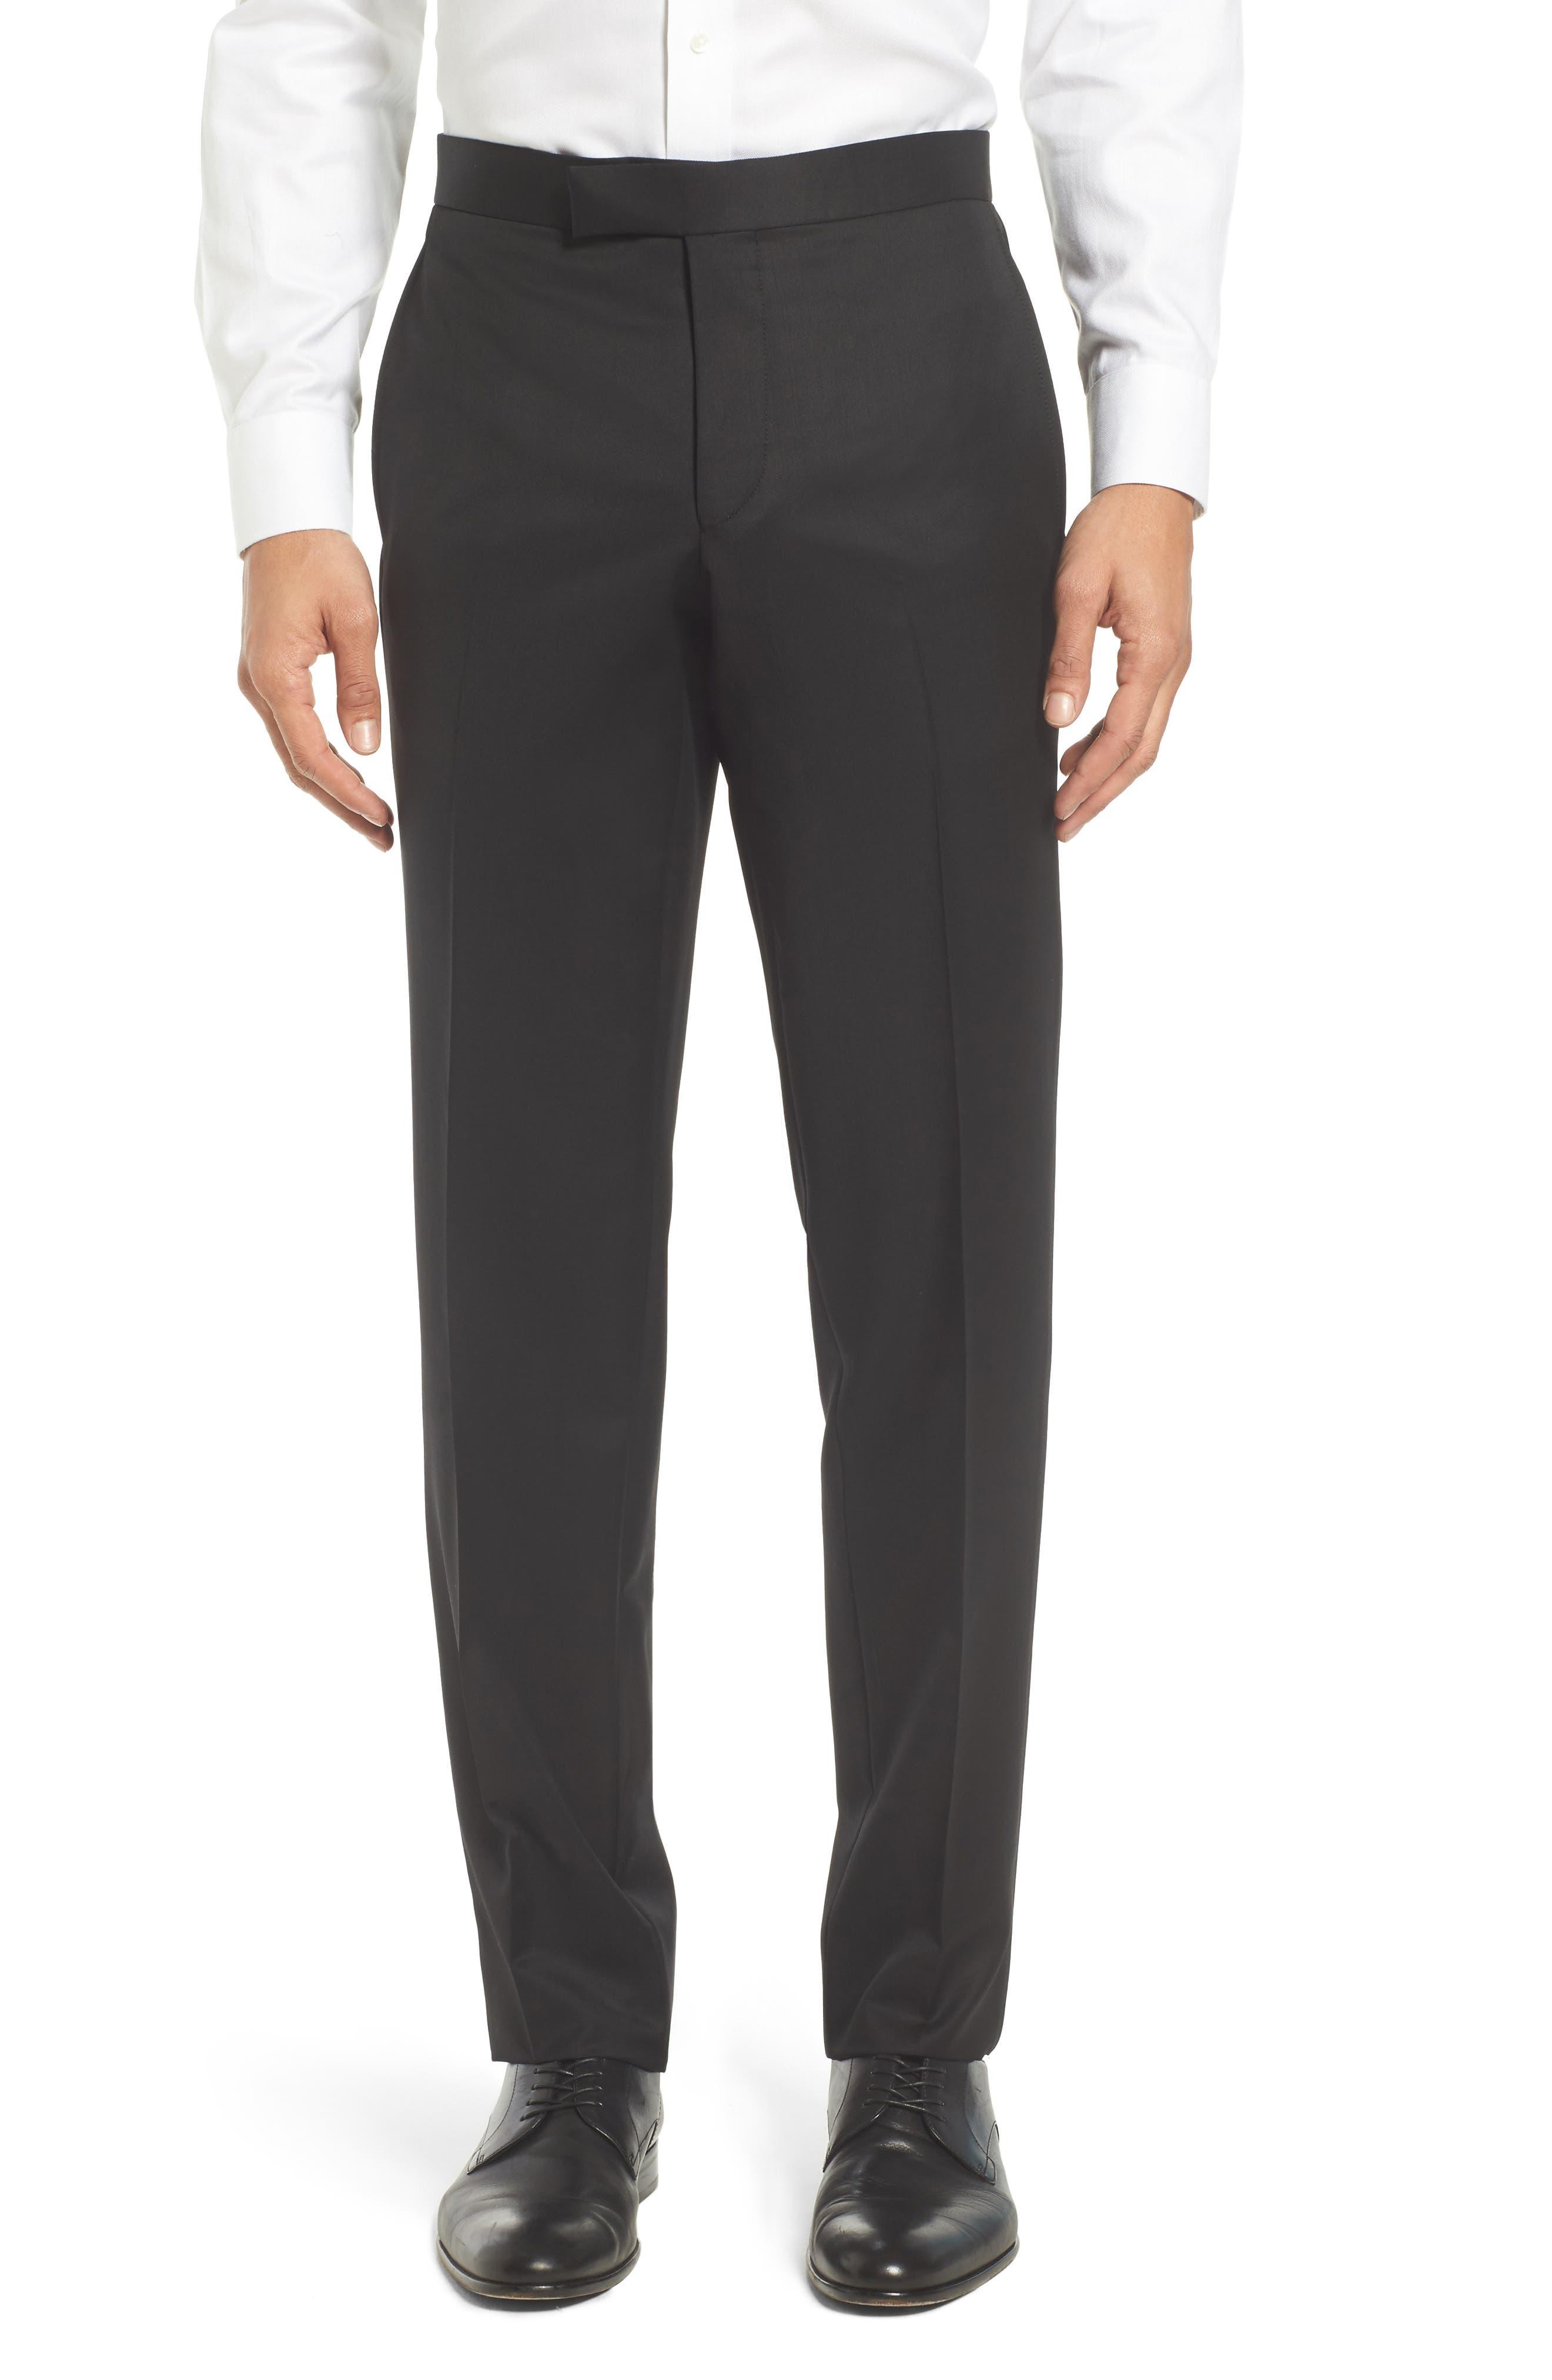 Josh Flat Front Wool & Mohair Tuxedo Pants,                             Main thumbnail 1, color,                             BLACK